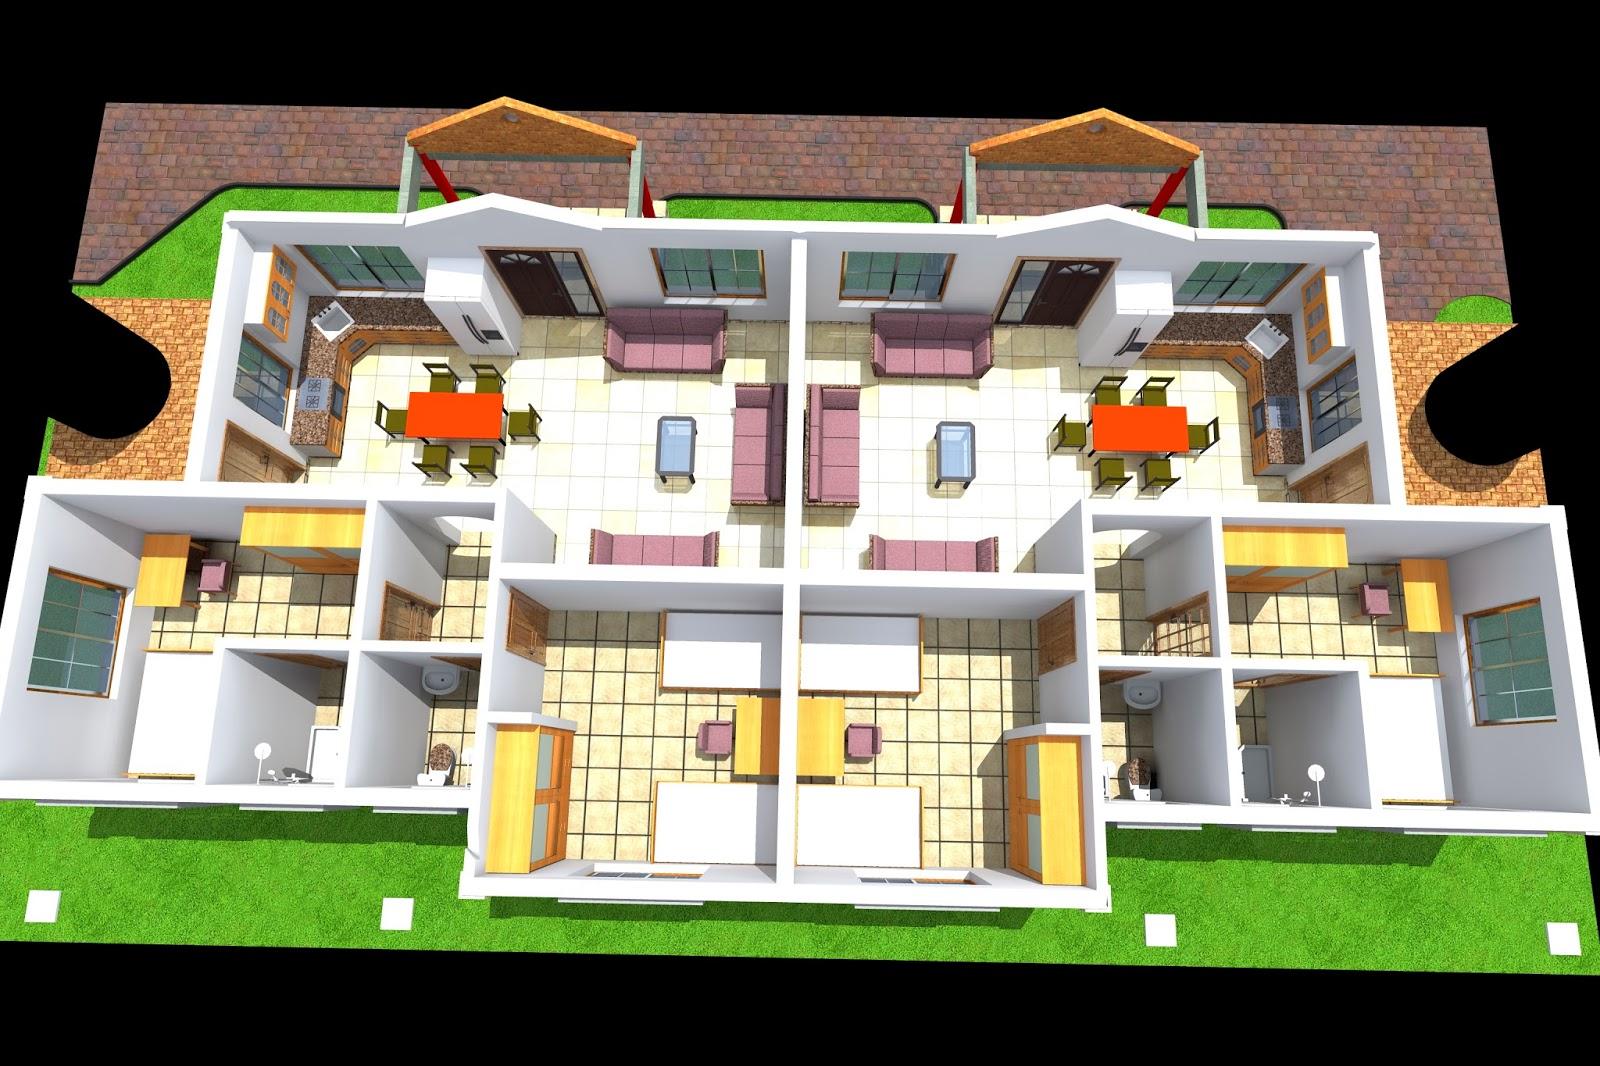 Tanzania modern house plans modern house house plans with photos in tanzania house plans tanzania free